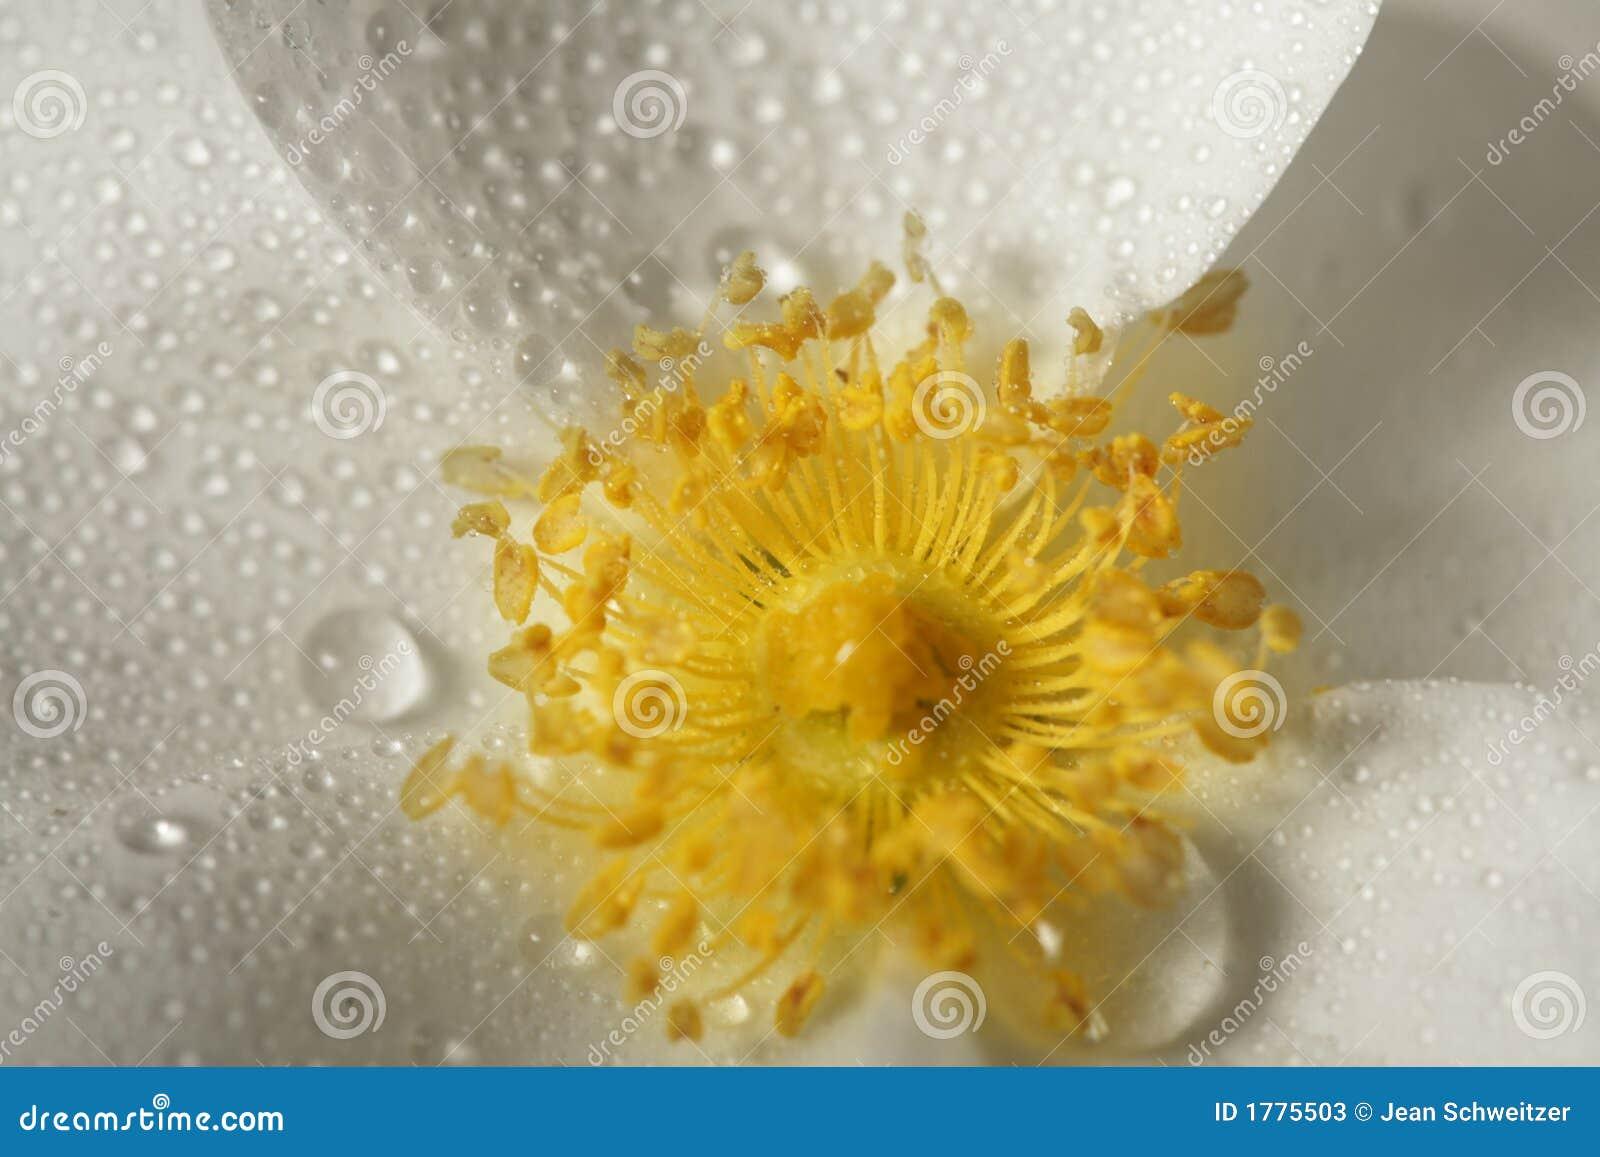 Gele bloemclose-up